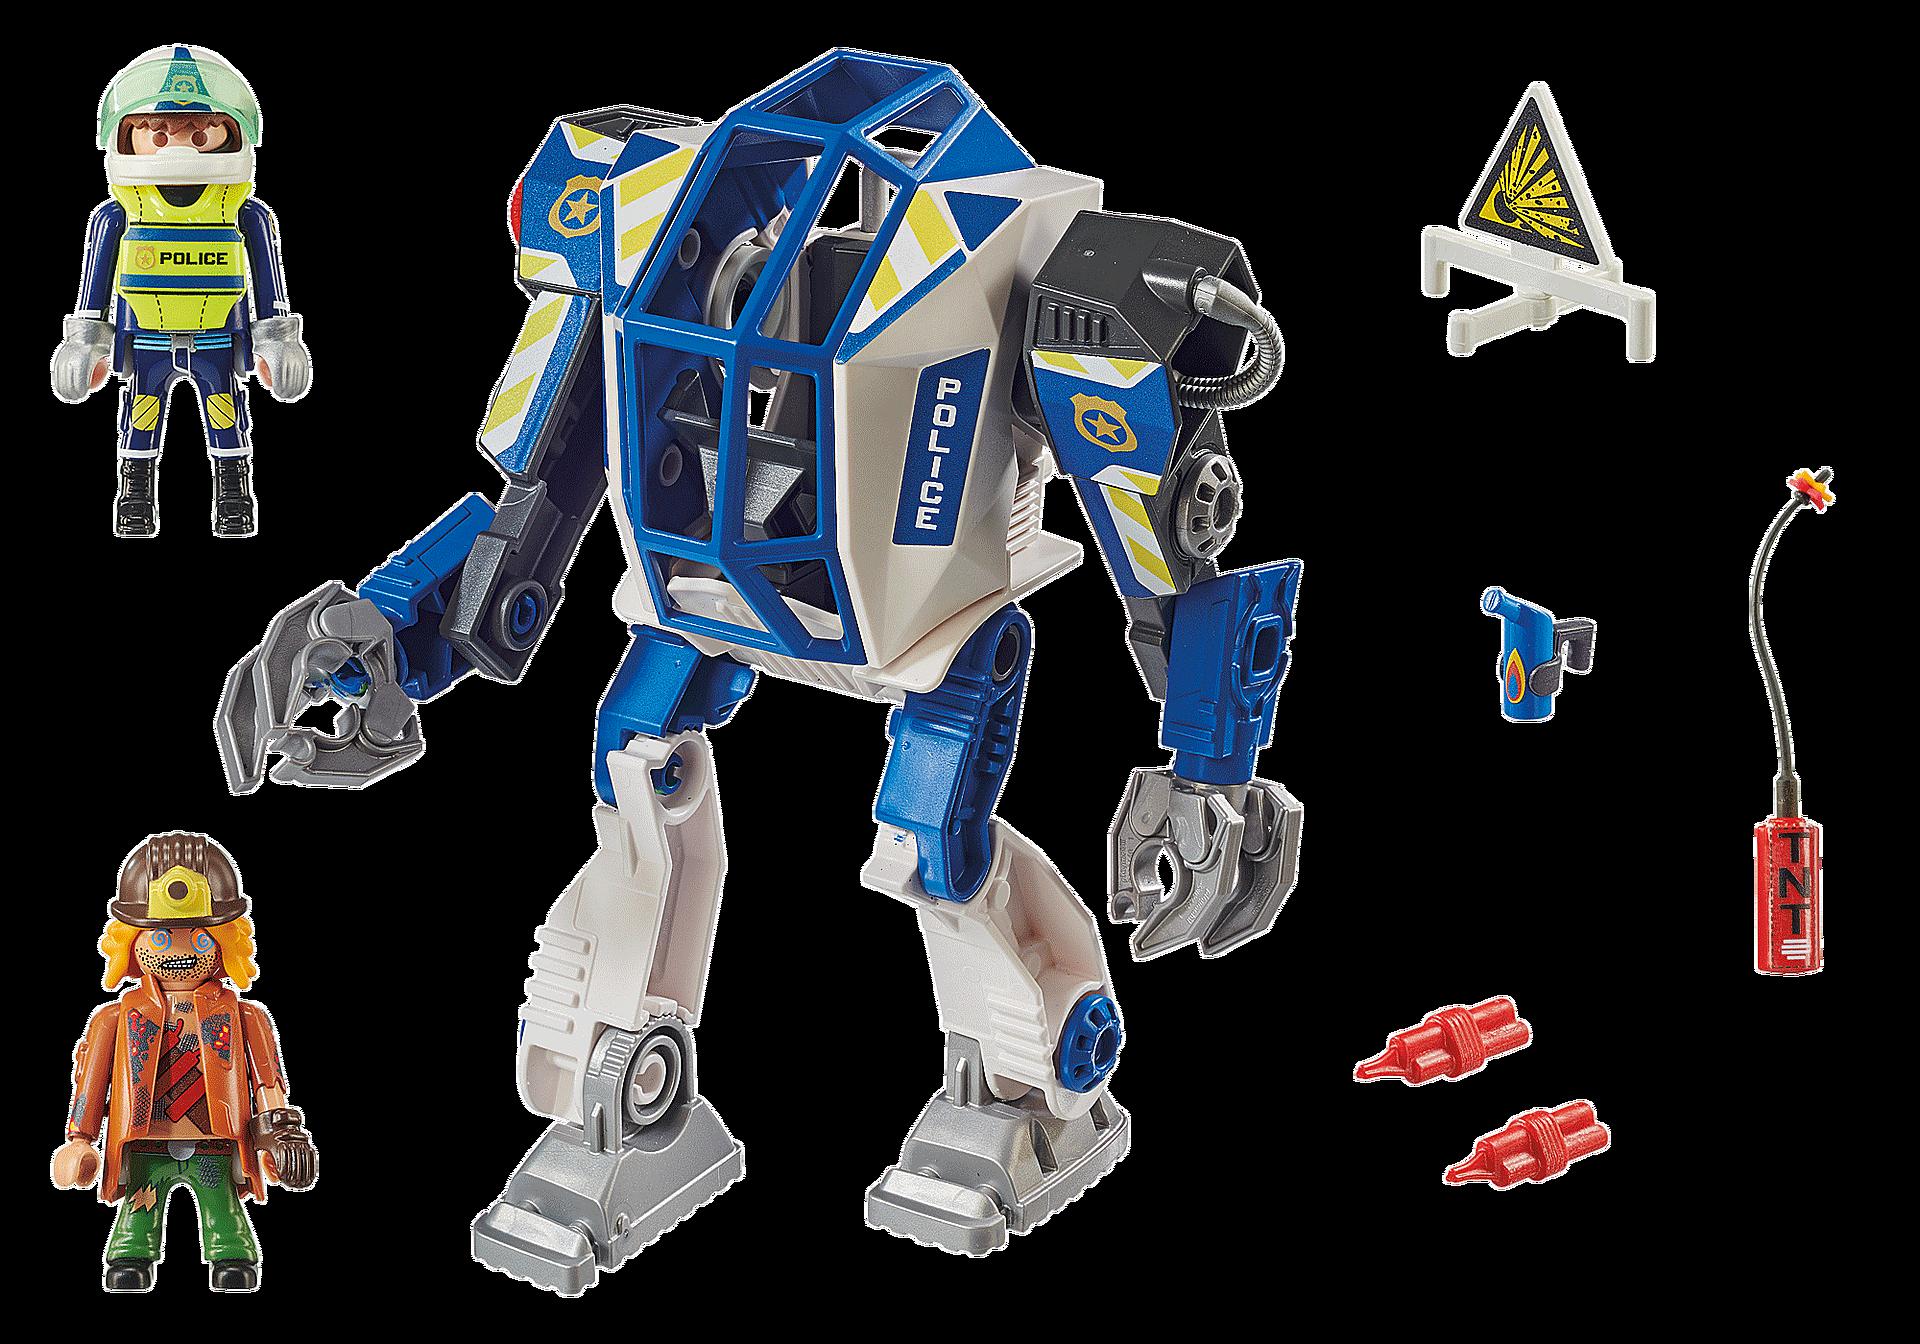 70571 Polizei-Roboter: Spezialeinsatz zoom image4